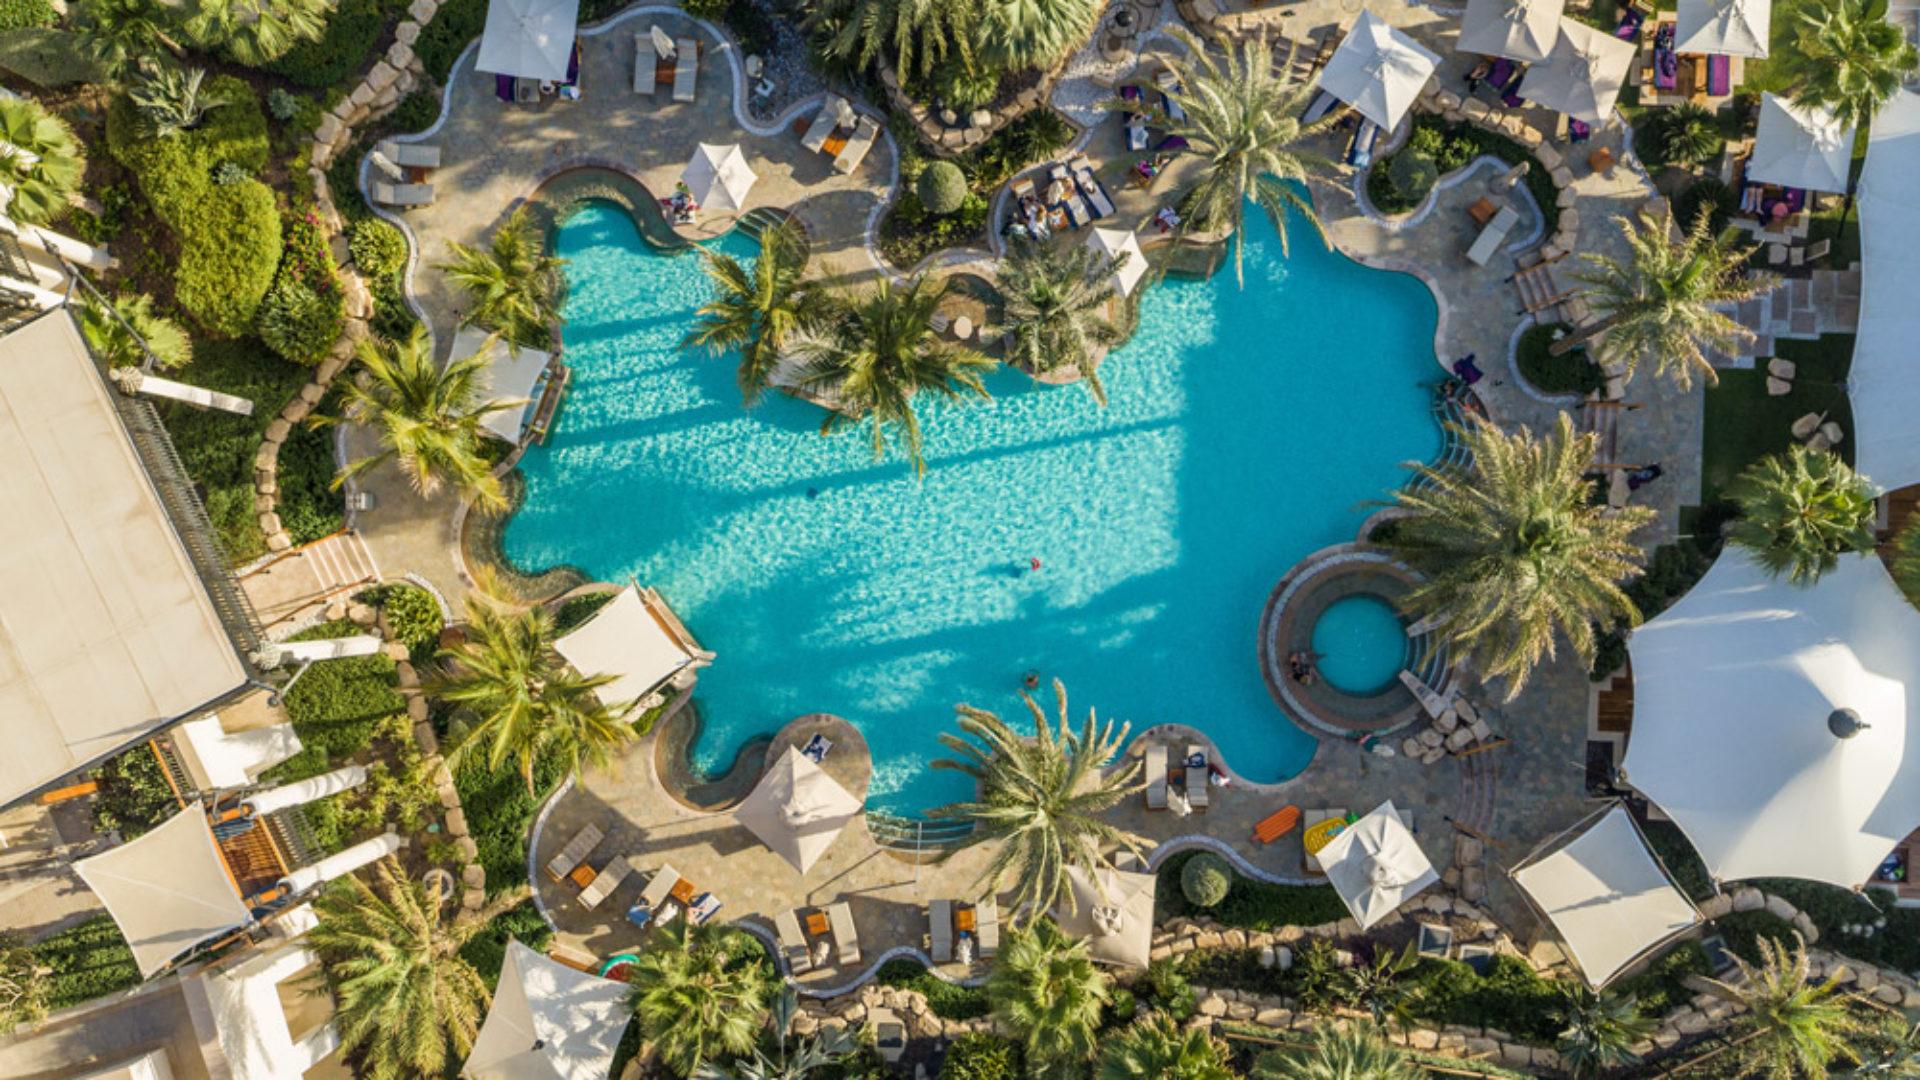 Wadi Pool Aerial Drone at the Jumeirah Al Naseem